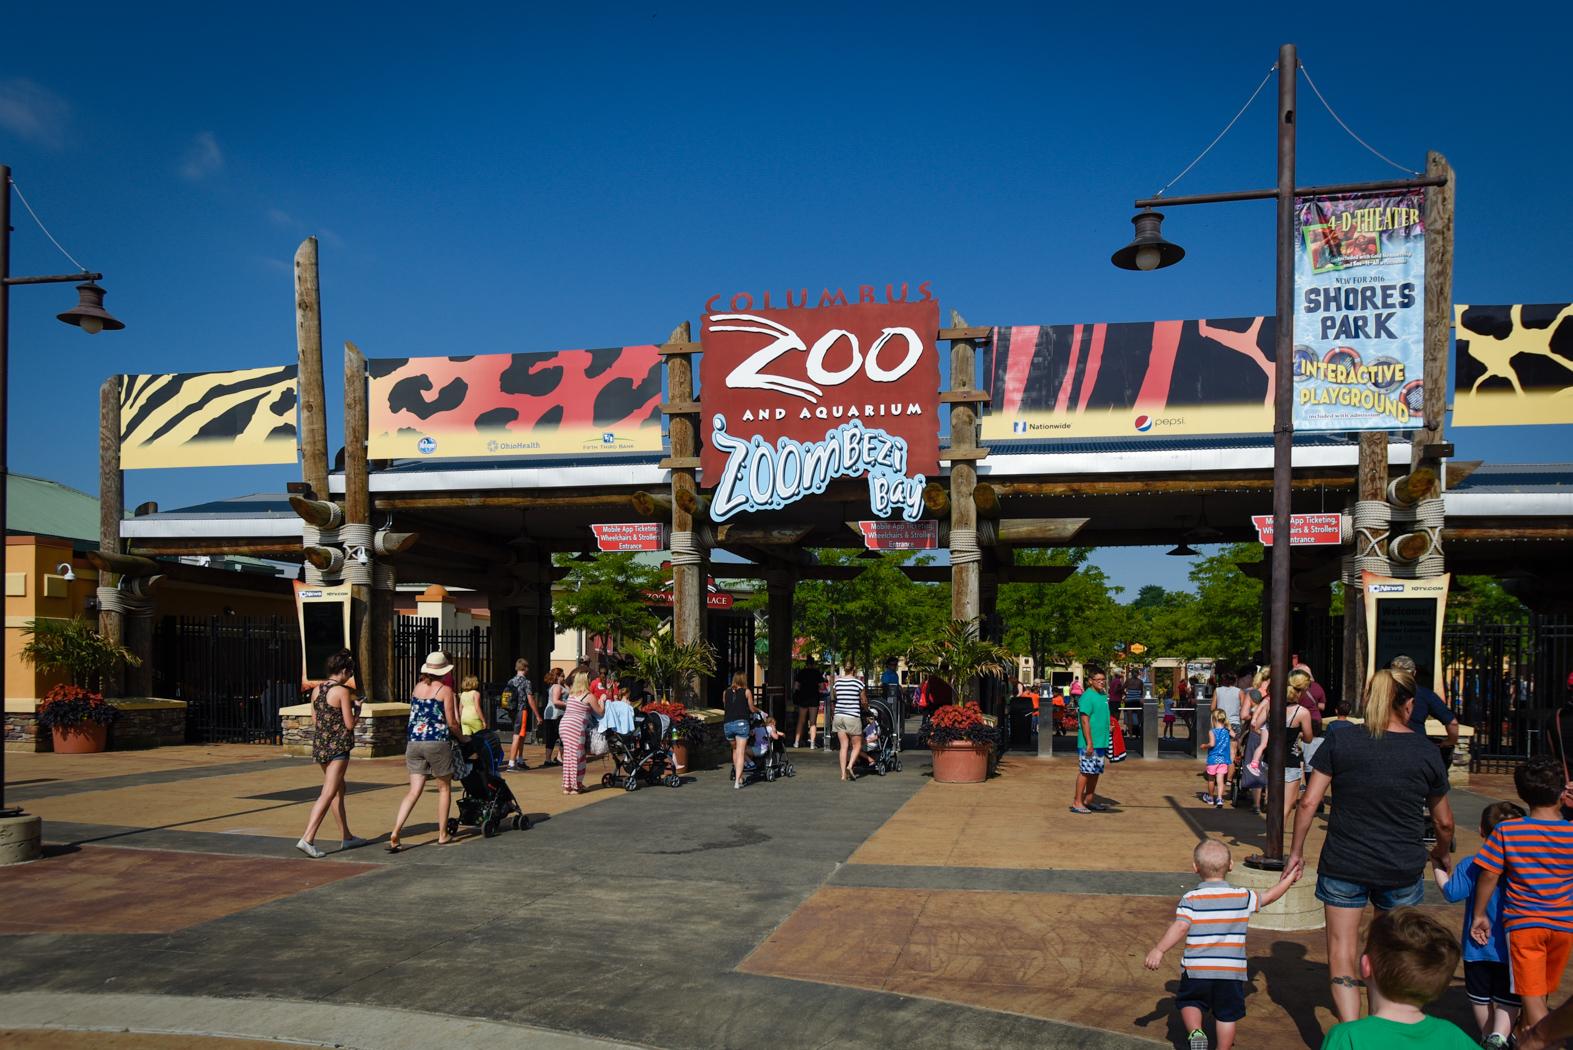 Columbus Zoo Gate Guests 2809 - Grahm S. Jones, Columbus Zoo and Aquarium